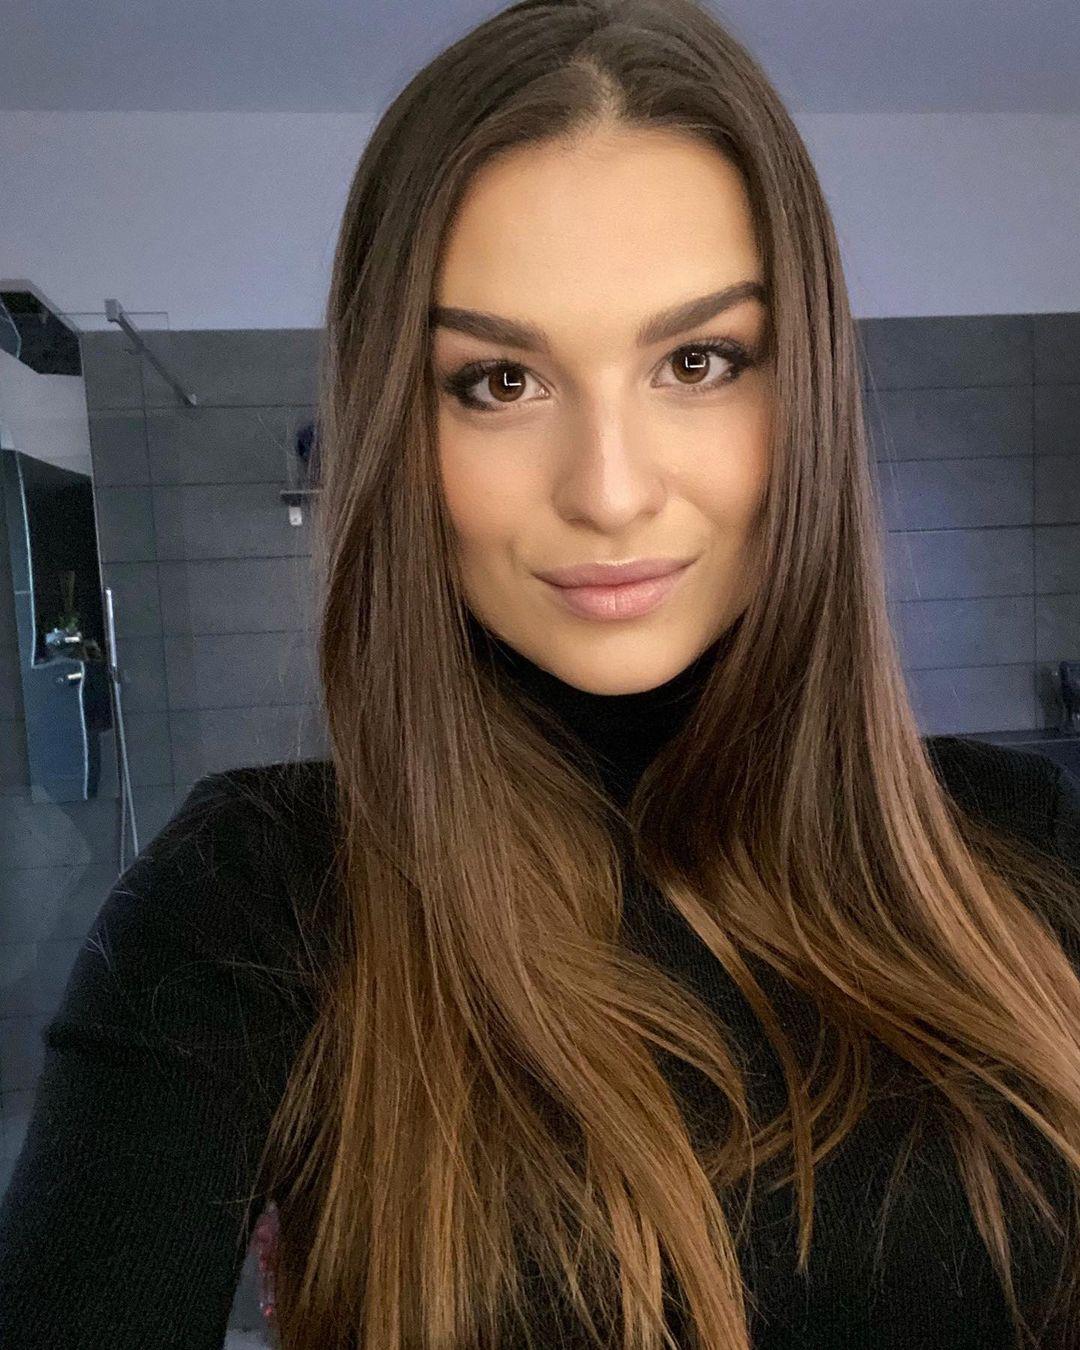 Dominika-Vinsova-Wallpapers-Insta-Fit-Bio-1